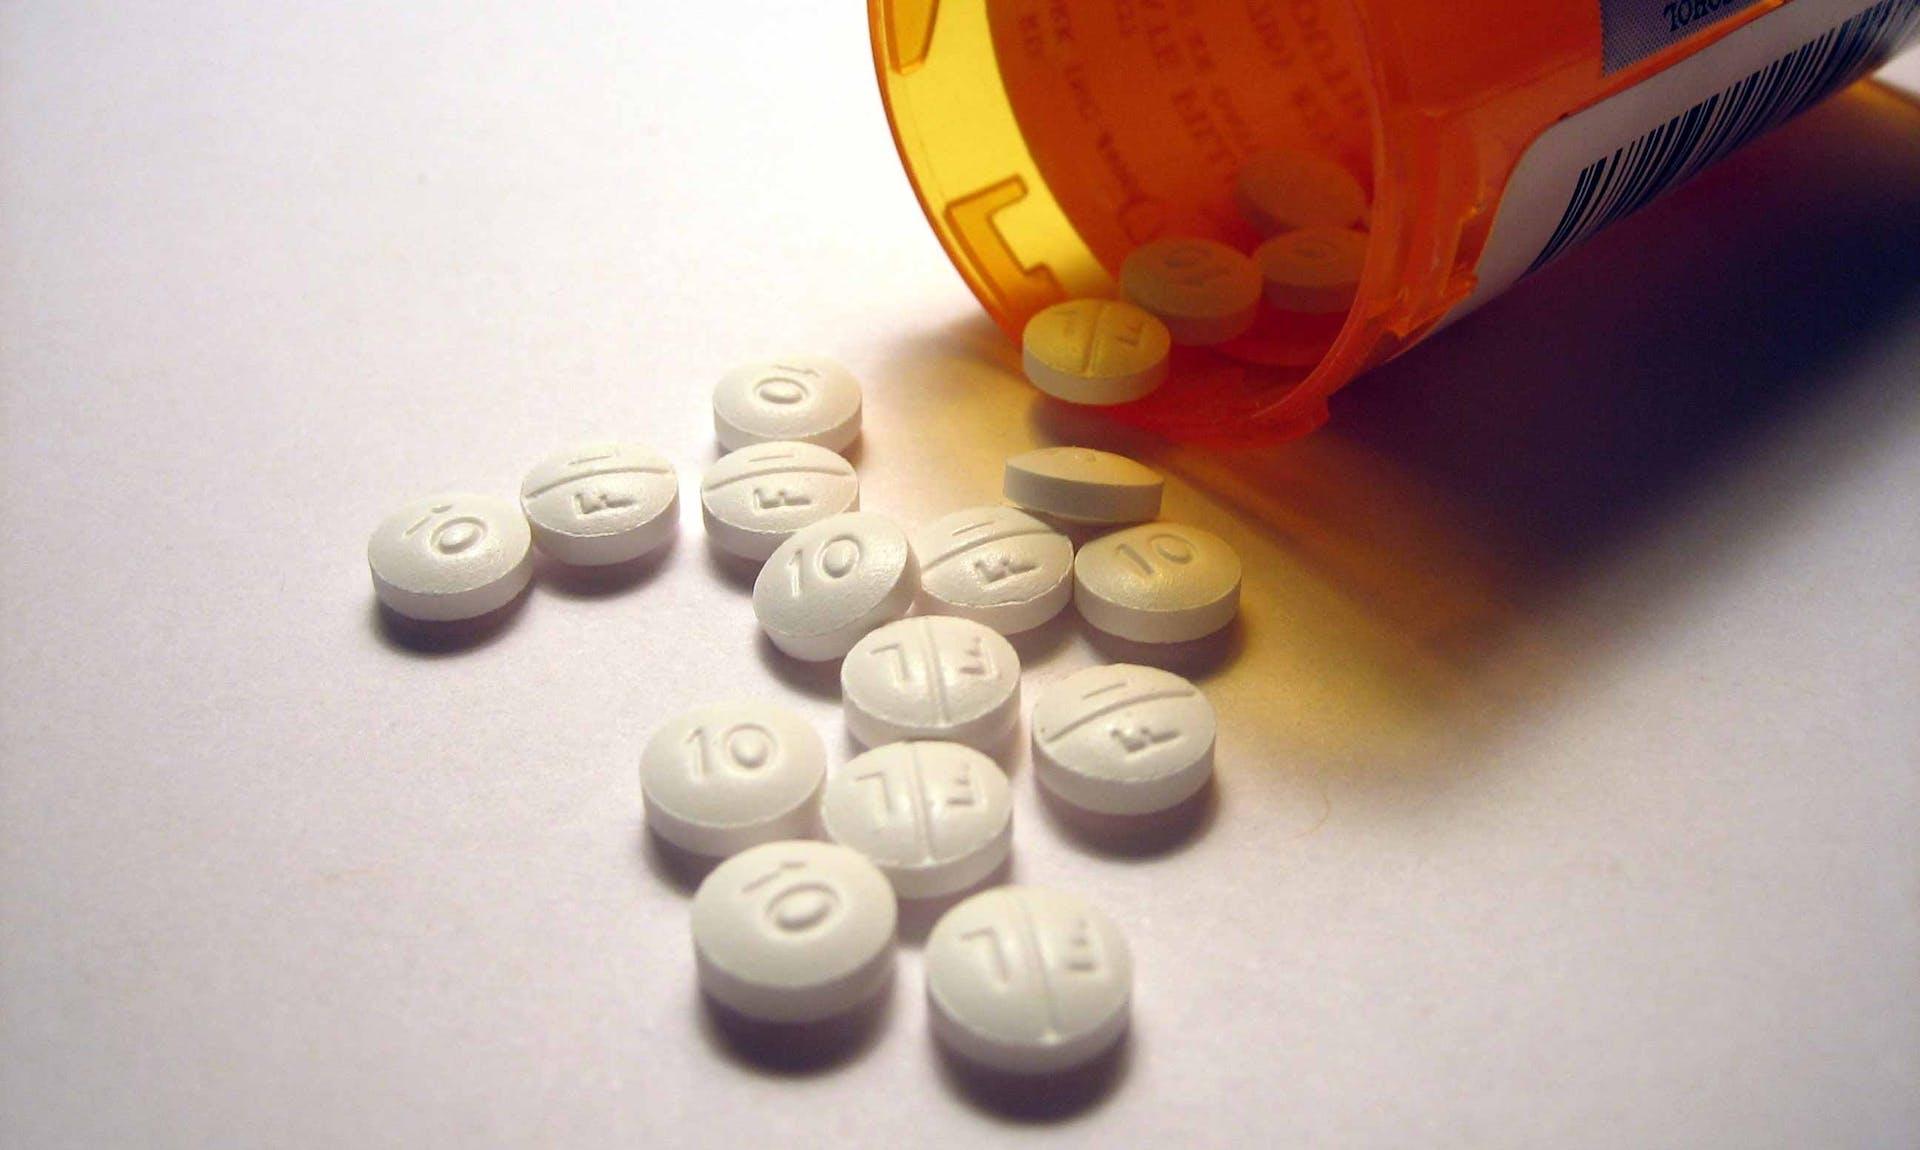 Lexapro pills